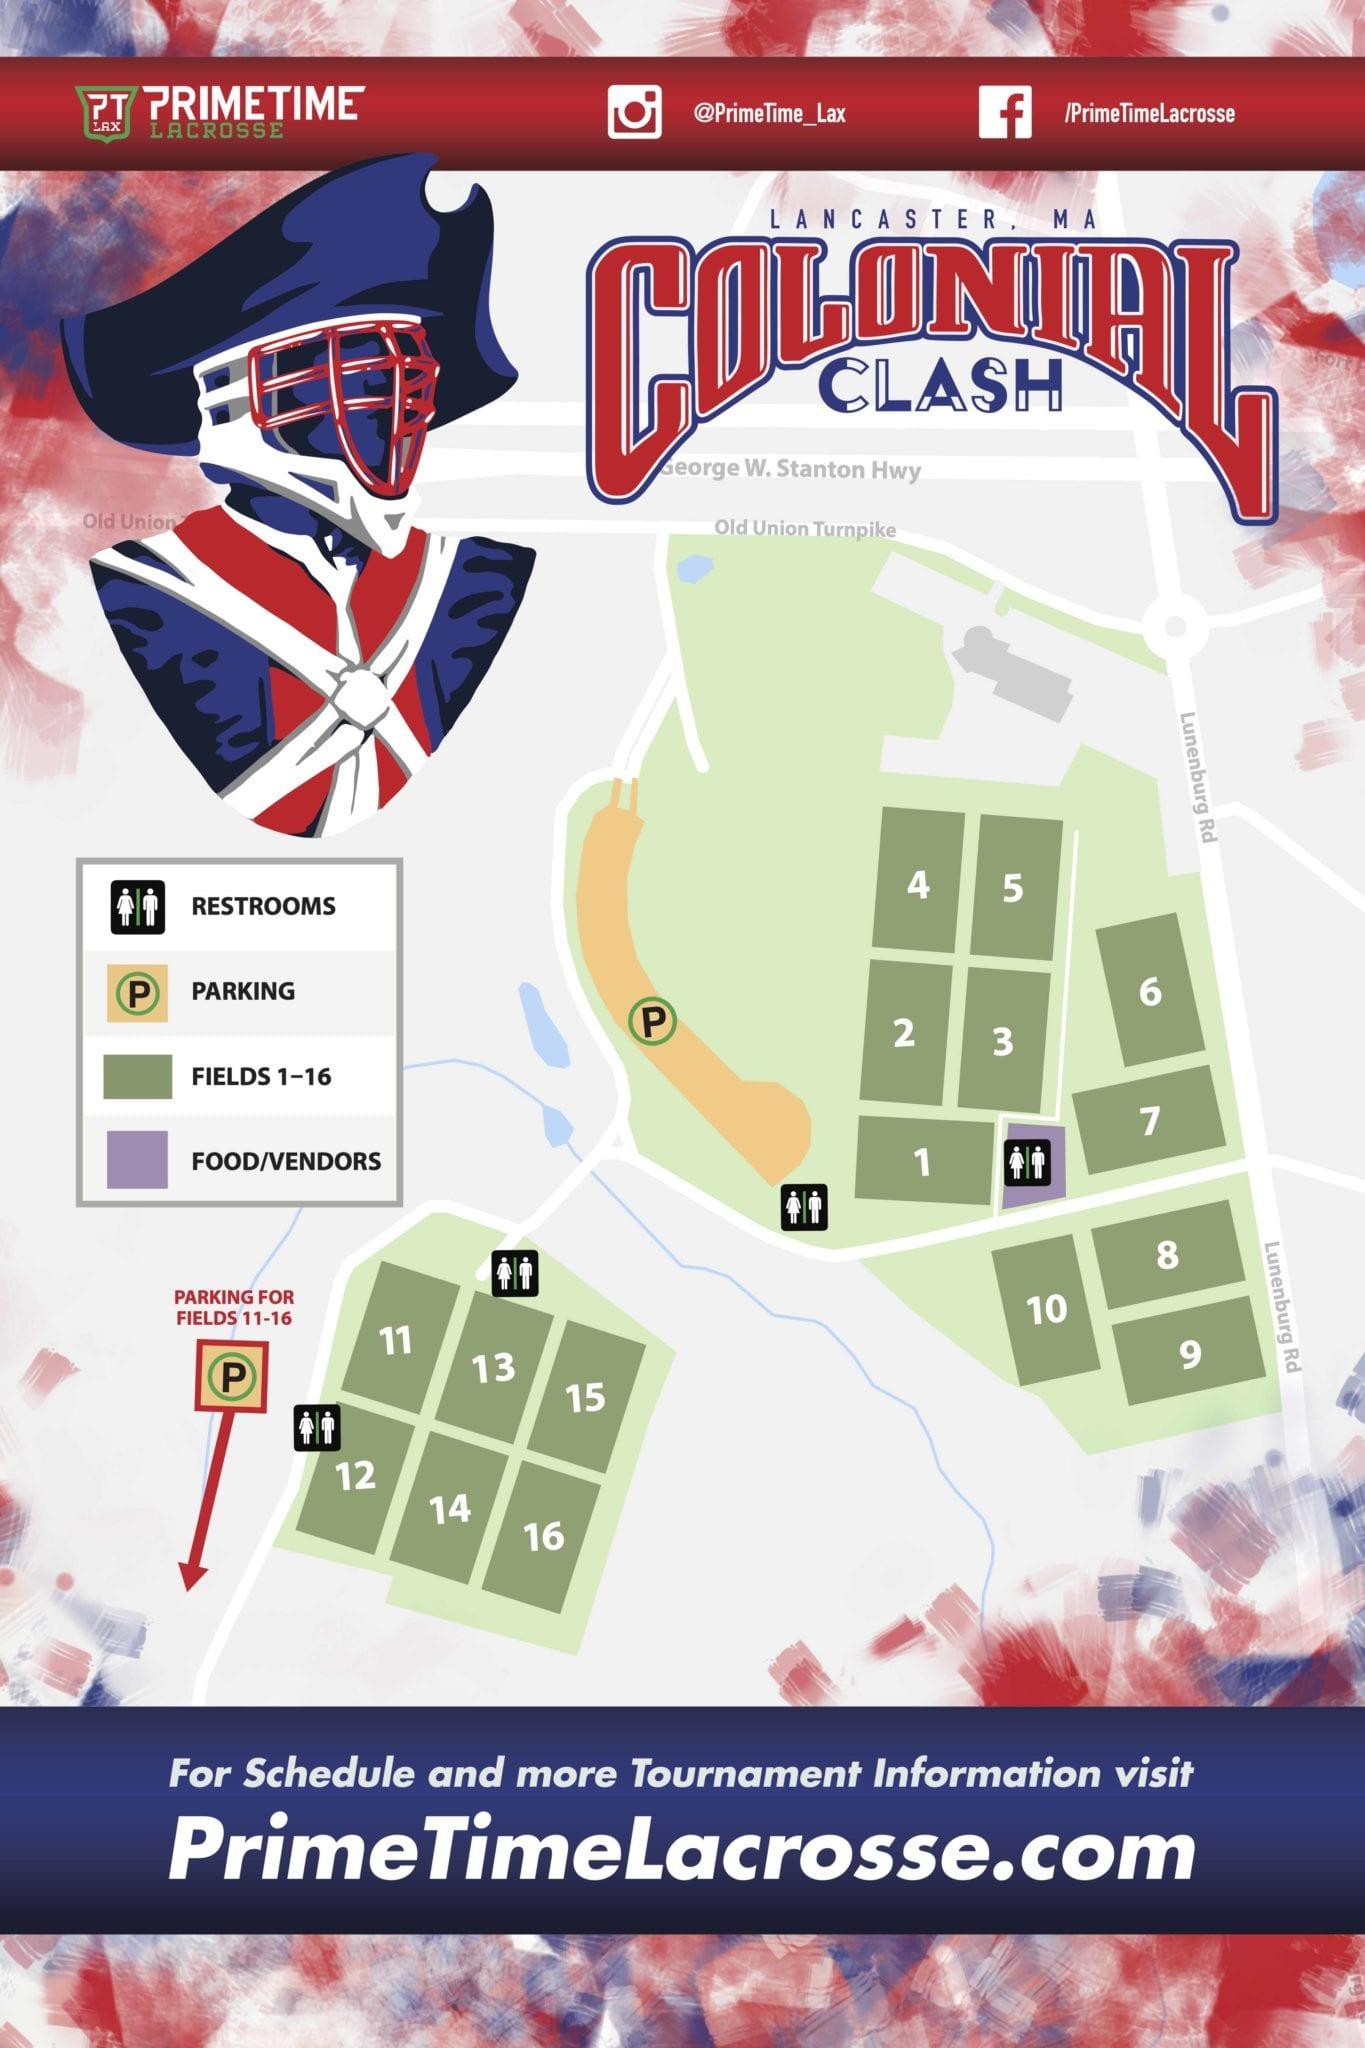 Colonial Clash Lacrosse Tournament - Primetime Lacrosse within Lakeshorecentral Boys And Girls Club Calendar